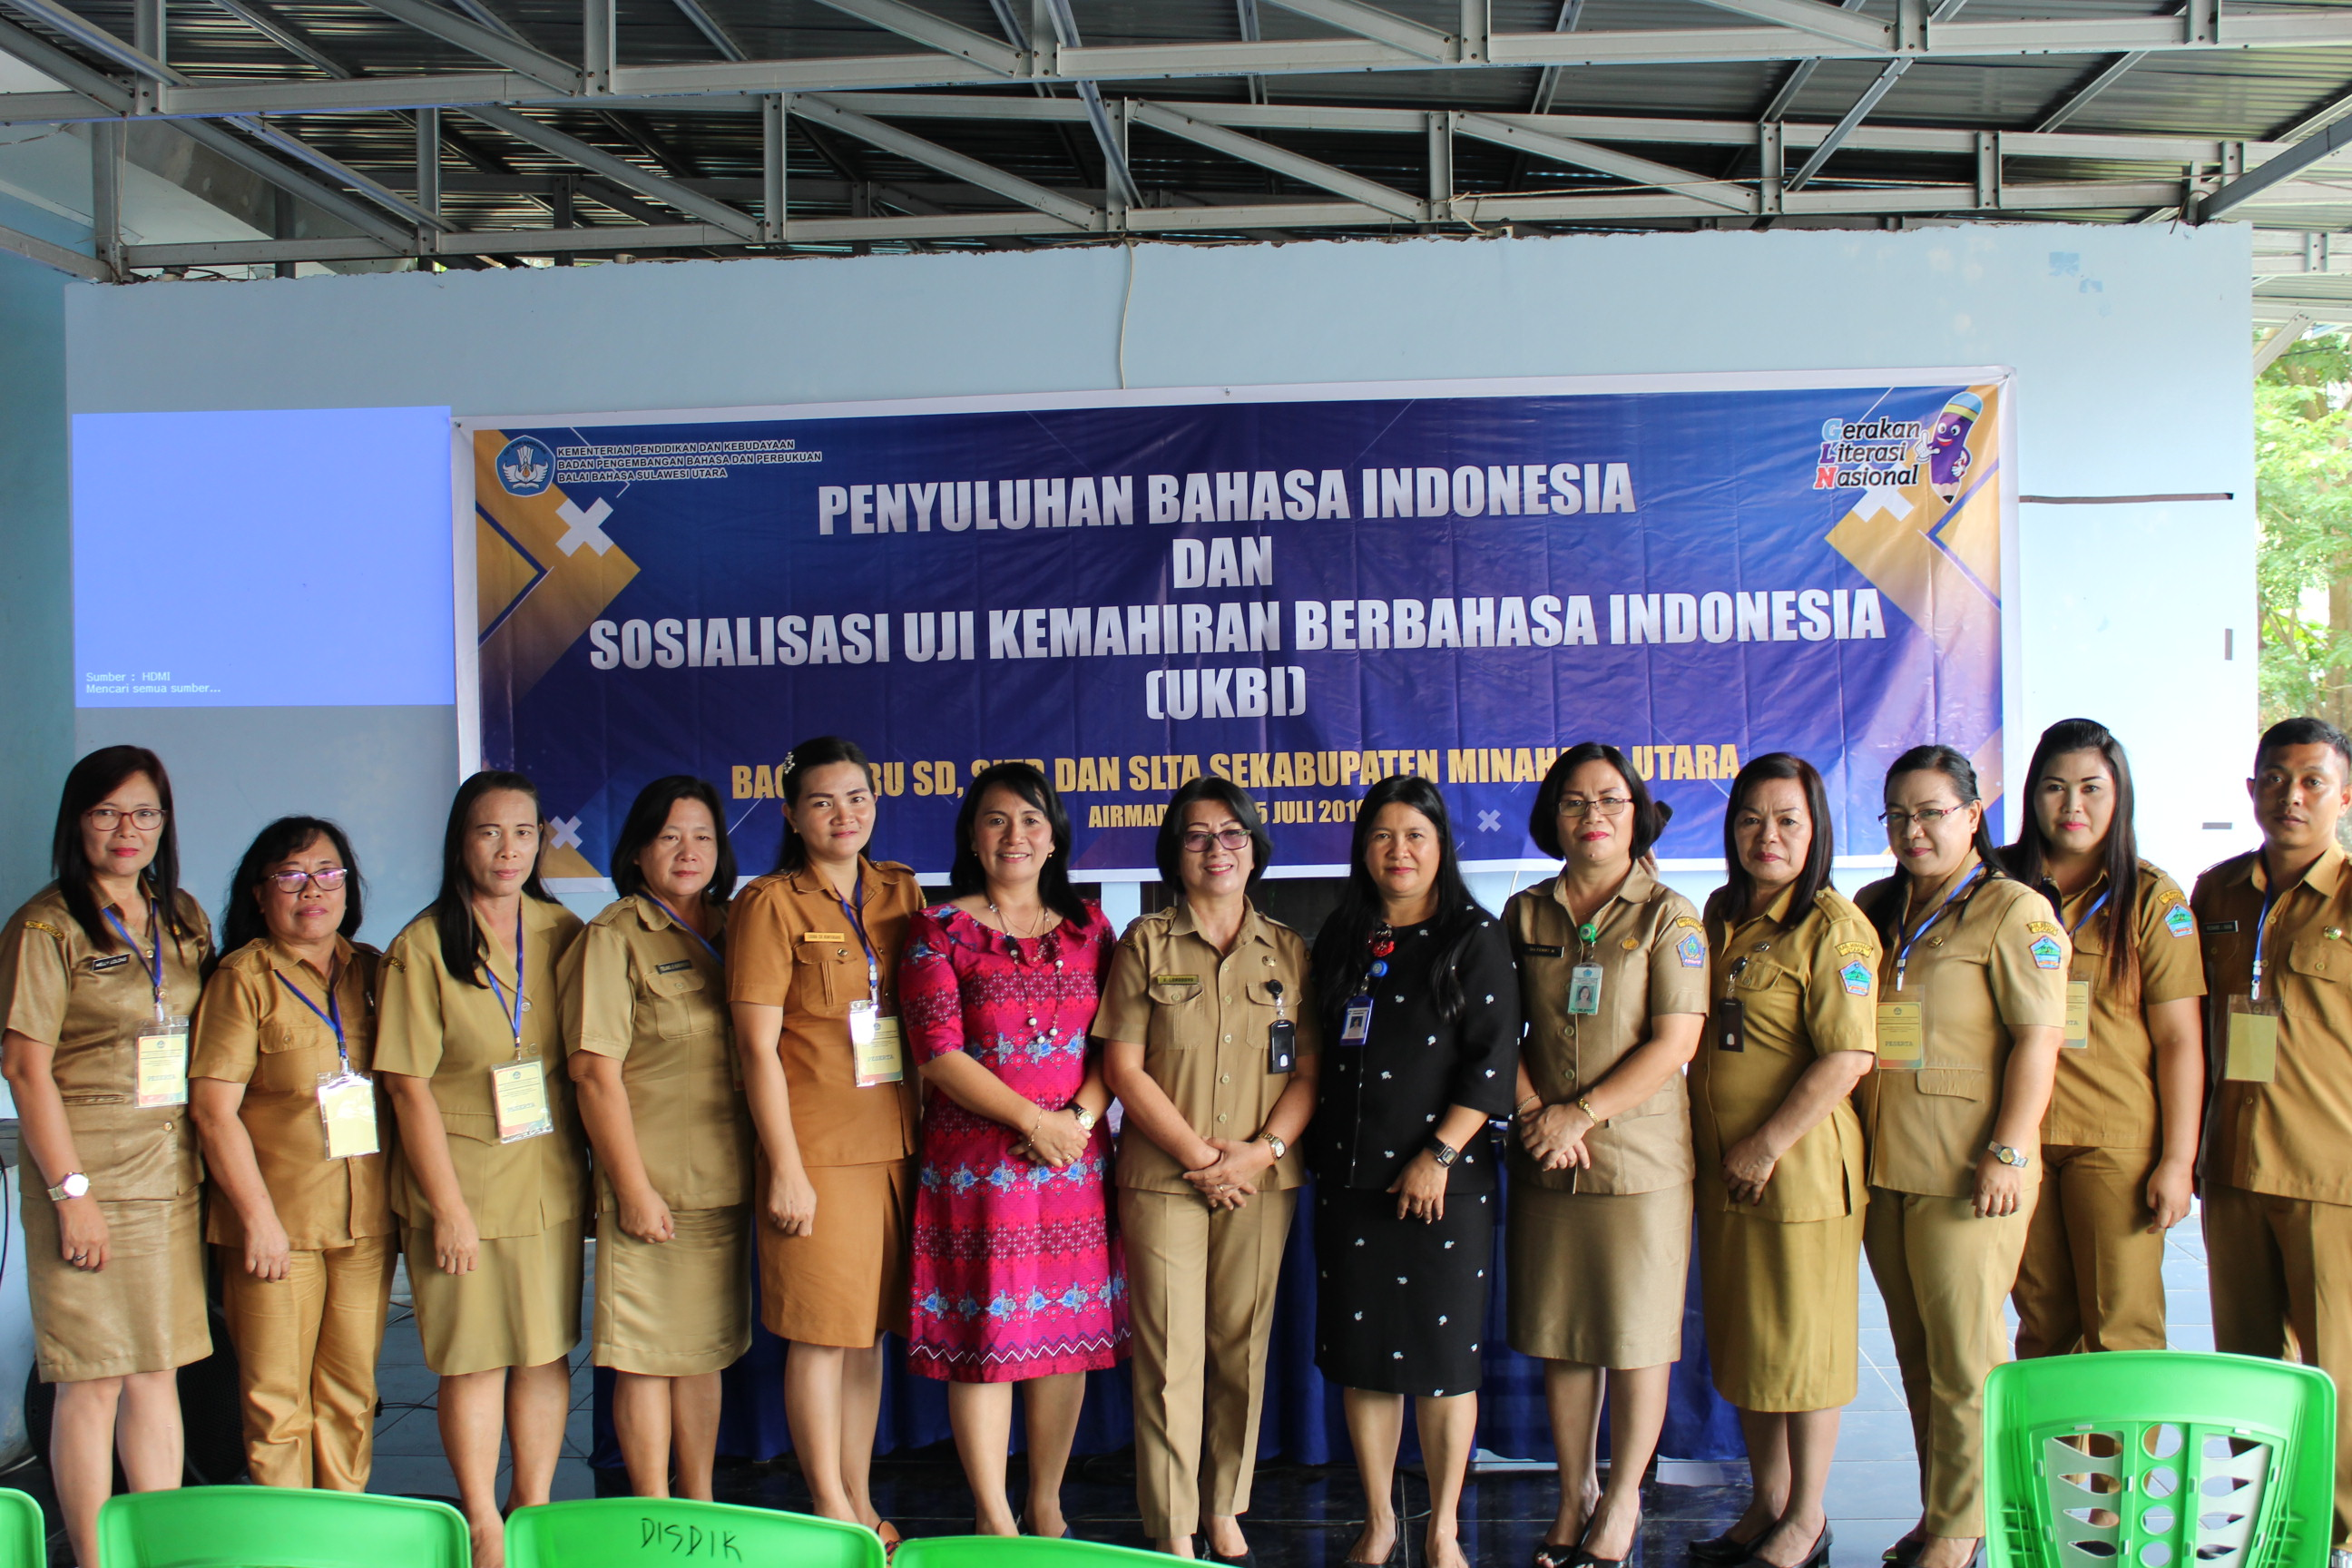 Penyuluhan Bahasa Indonesia dan Sosialisasi Uji Kemahiran Berbahasa Indonesia di Minahasa Utara